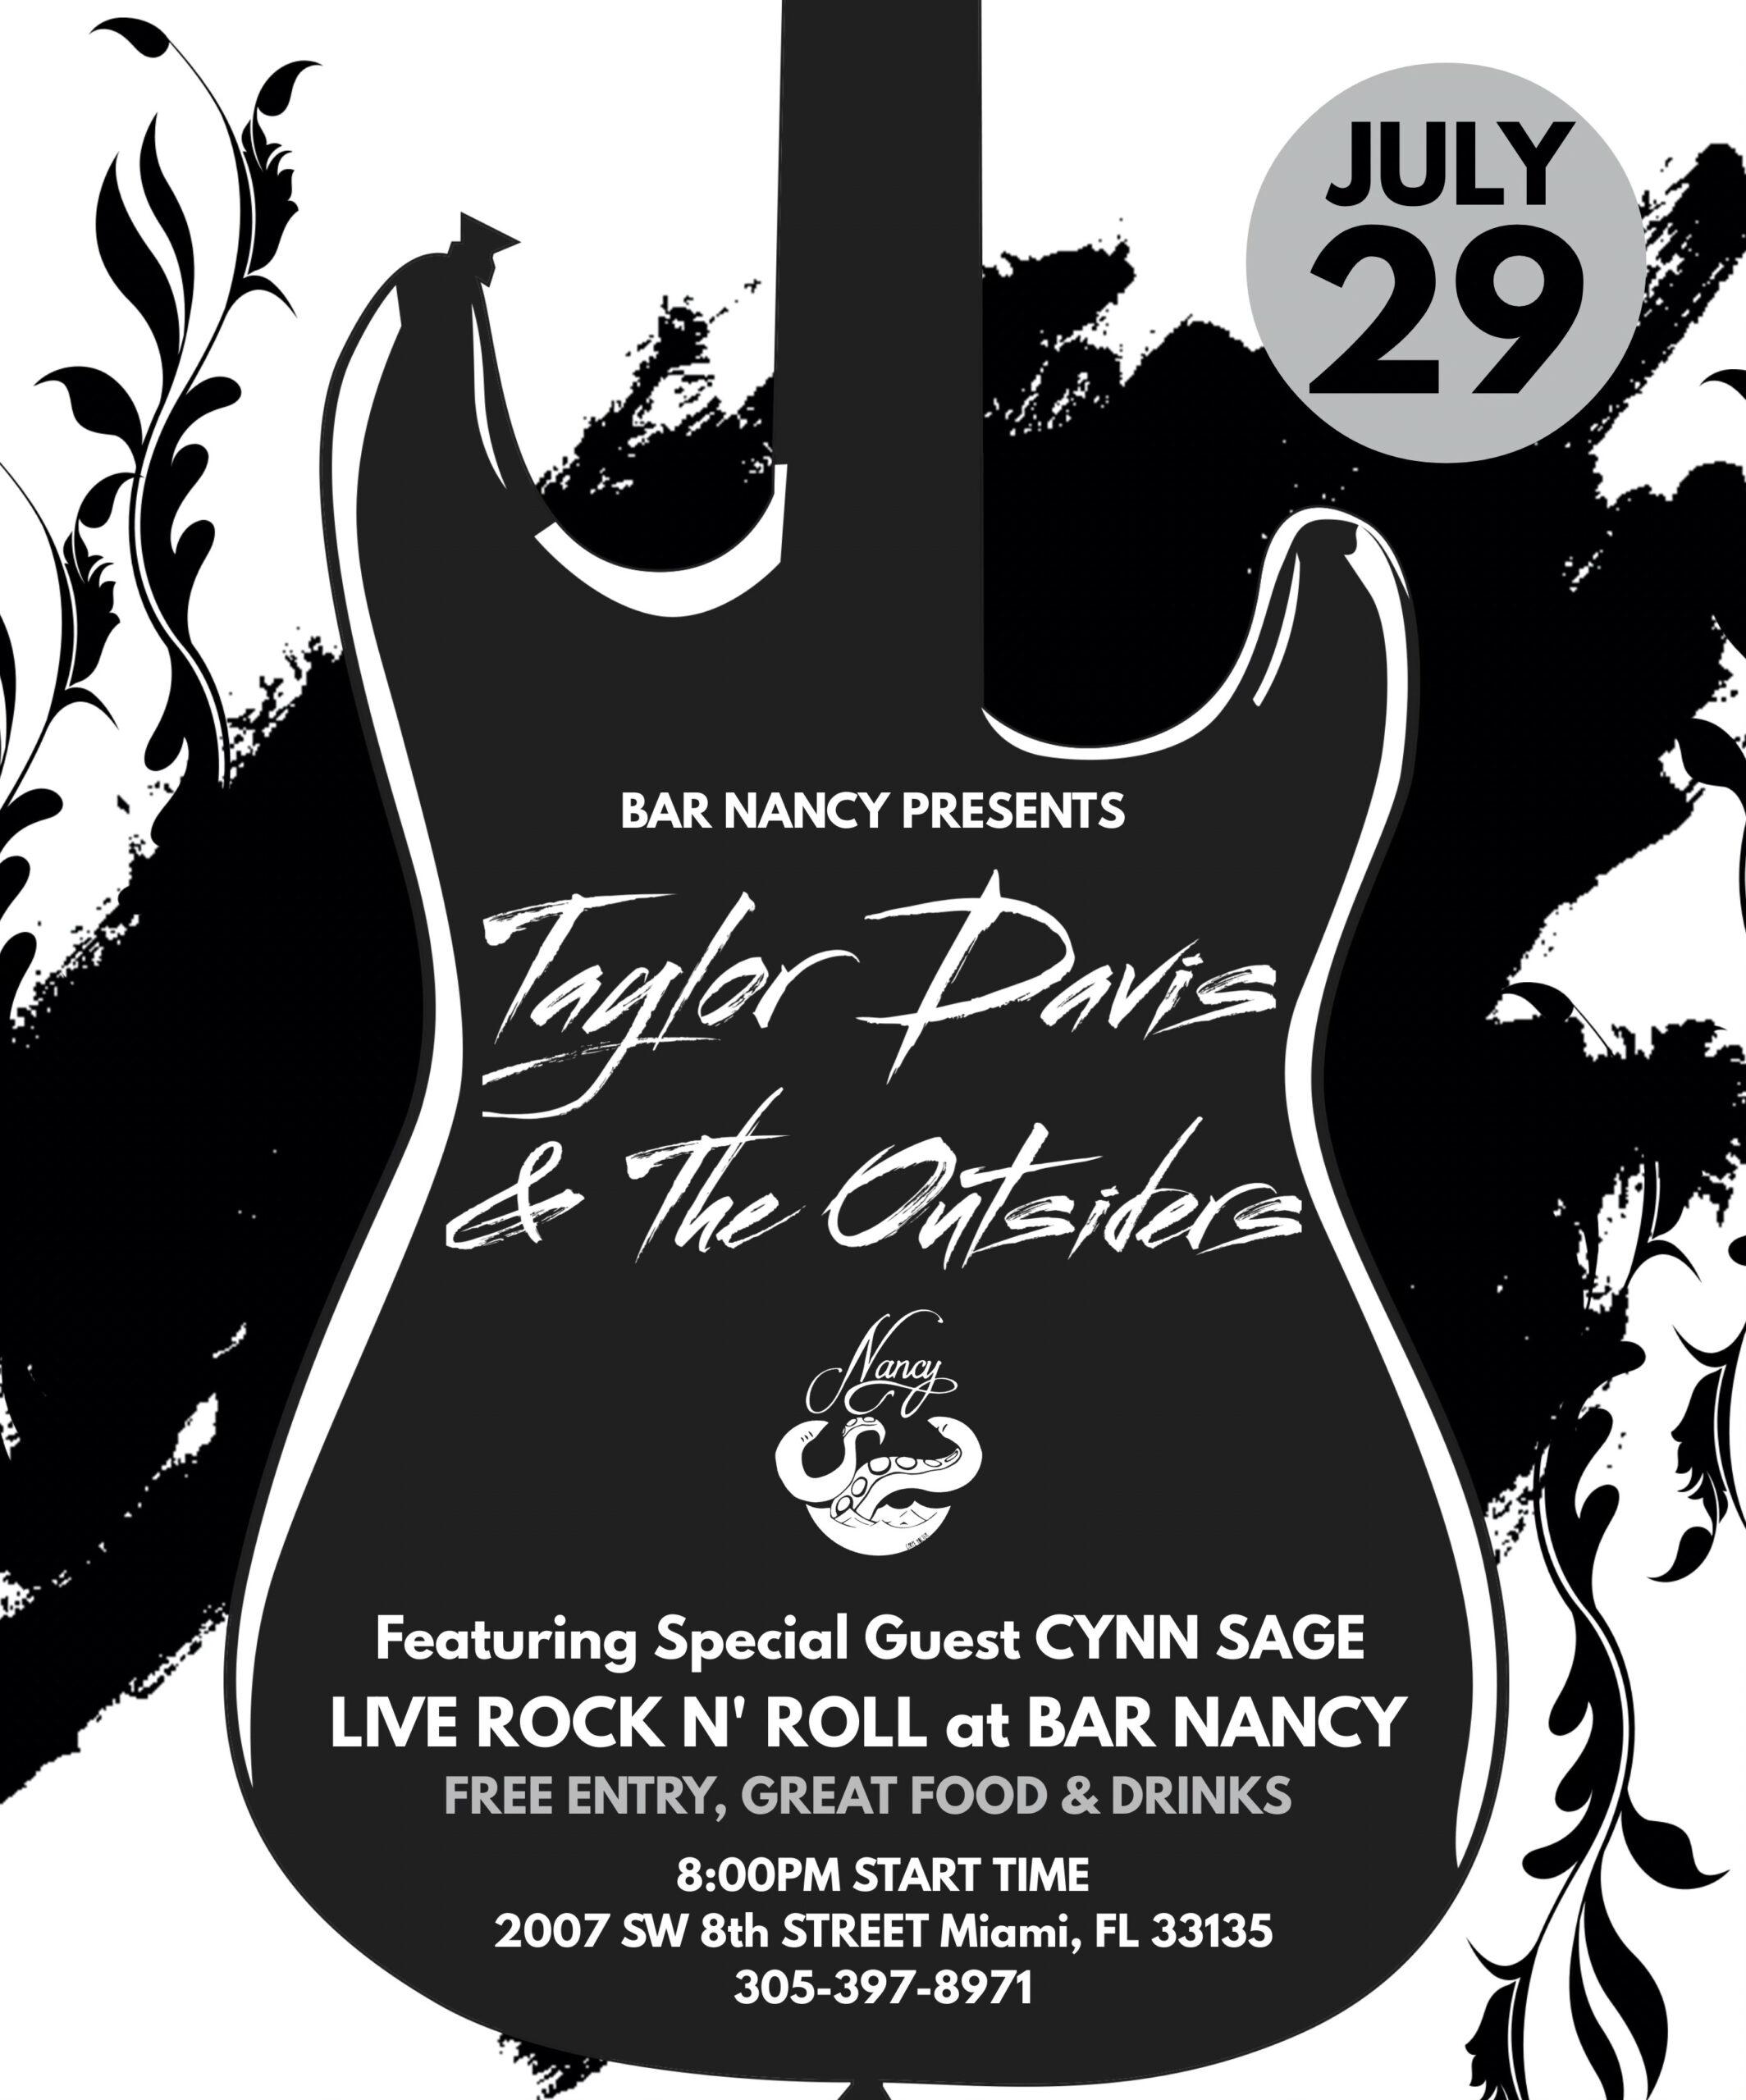 Taylor Davis and the Outsiders at Bar Nancy July 29